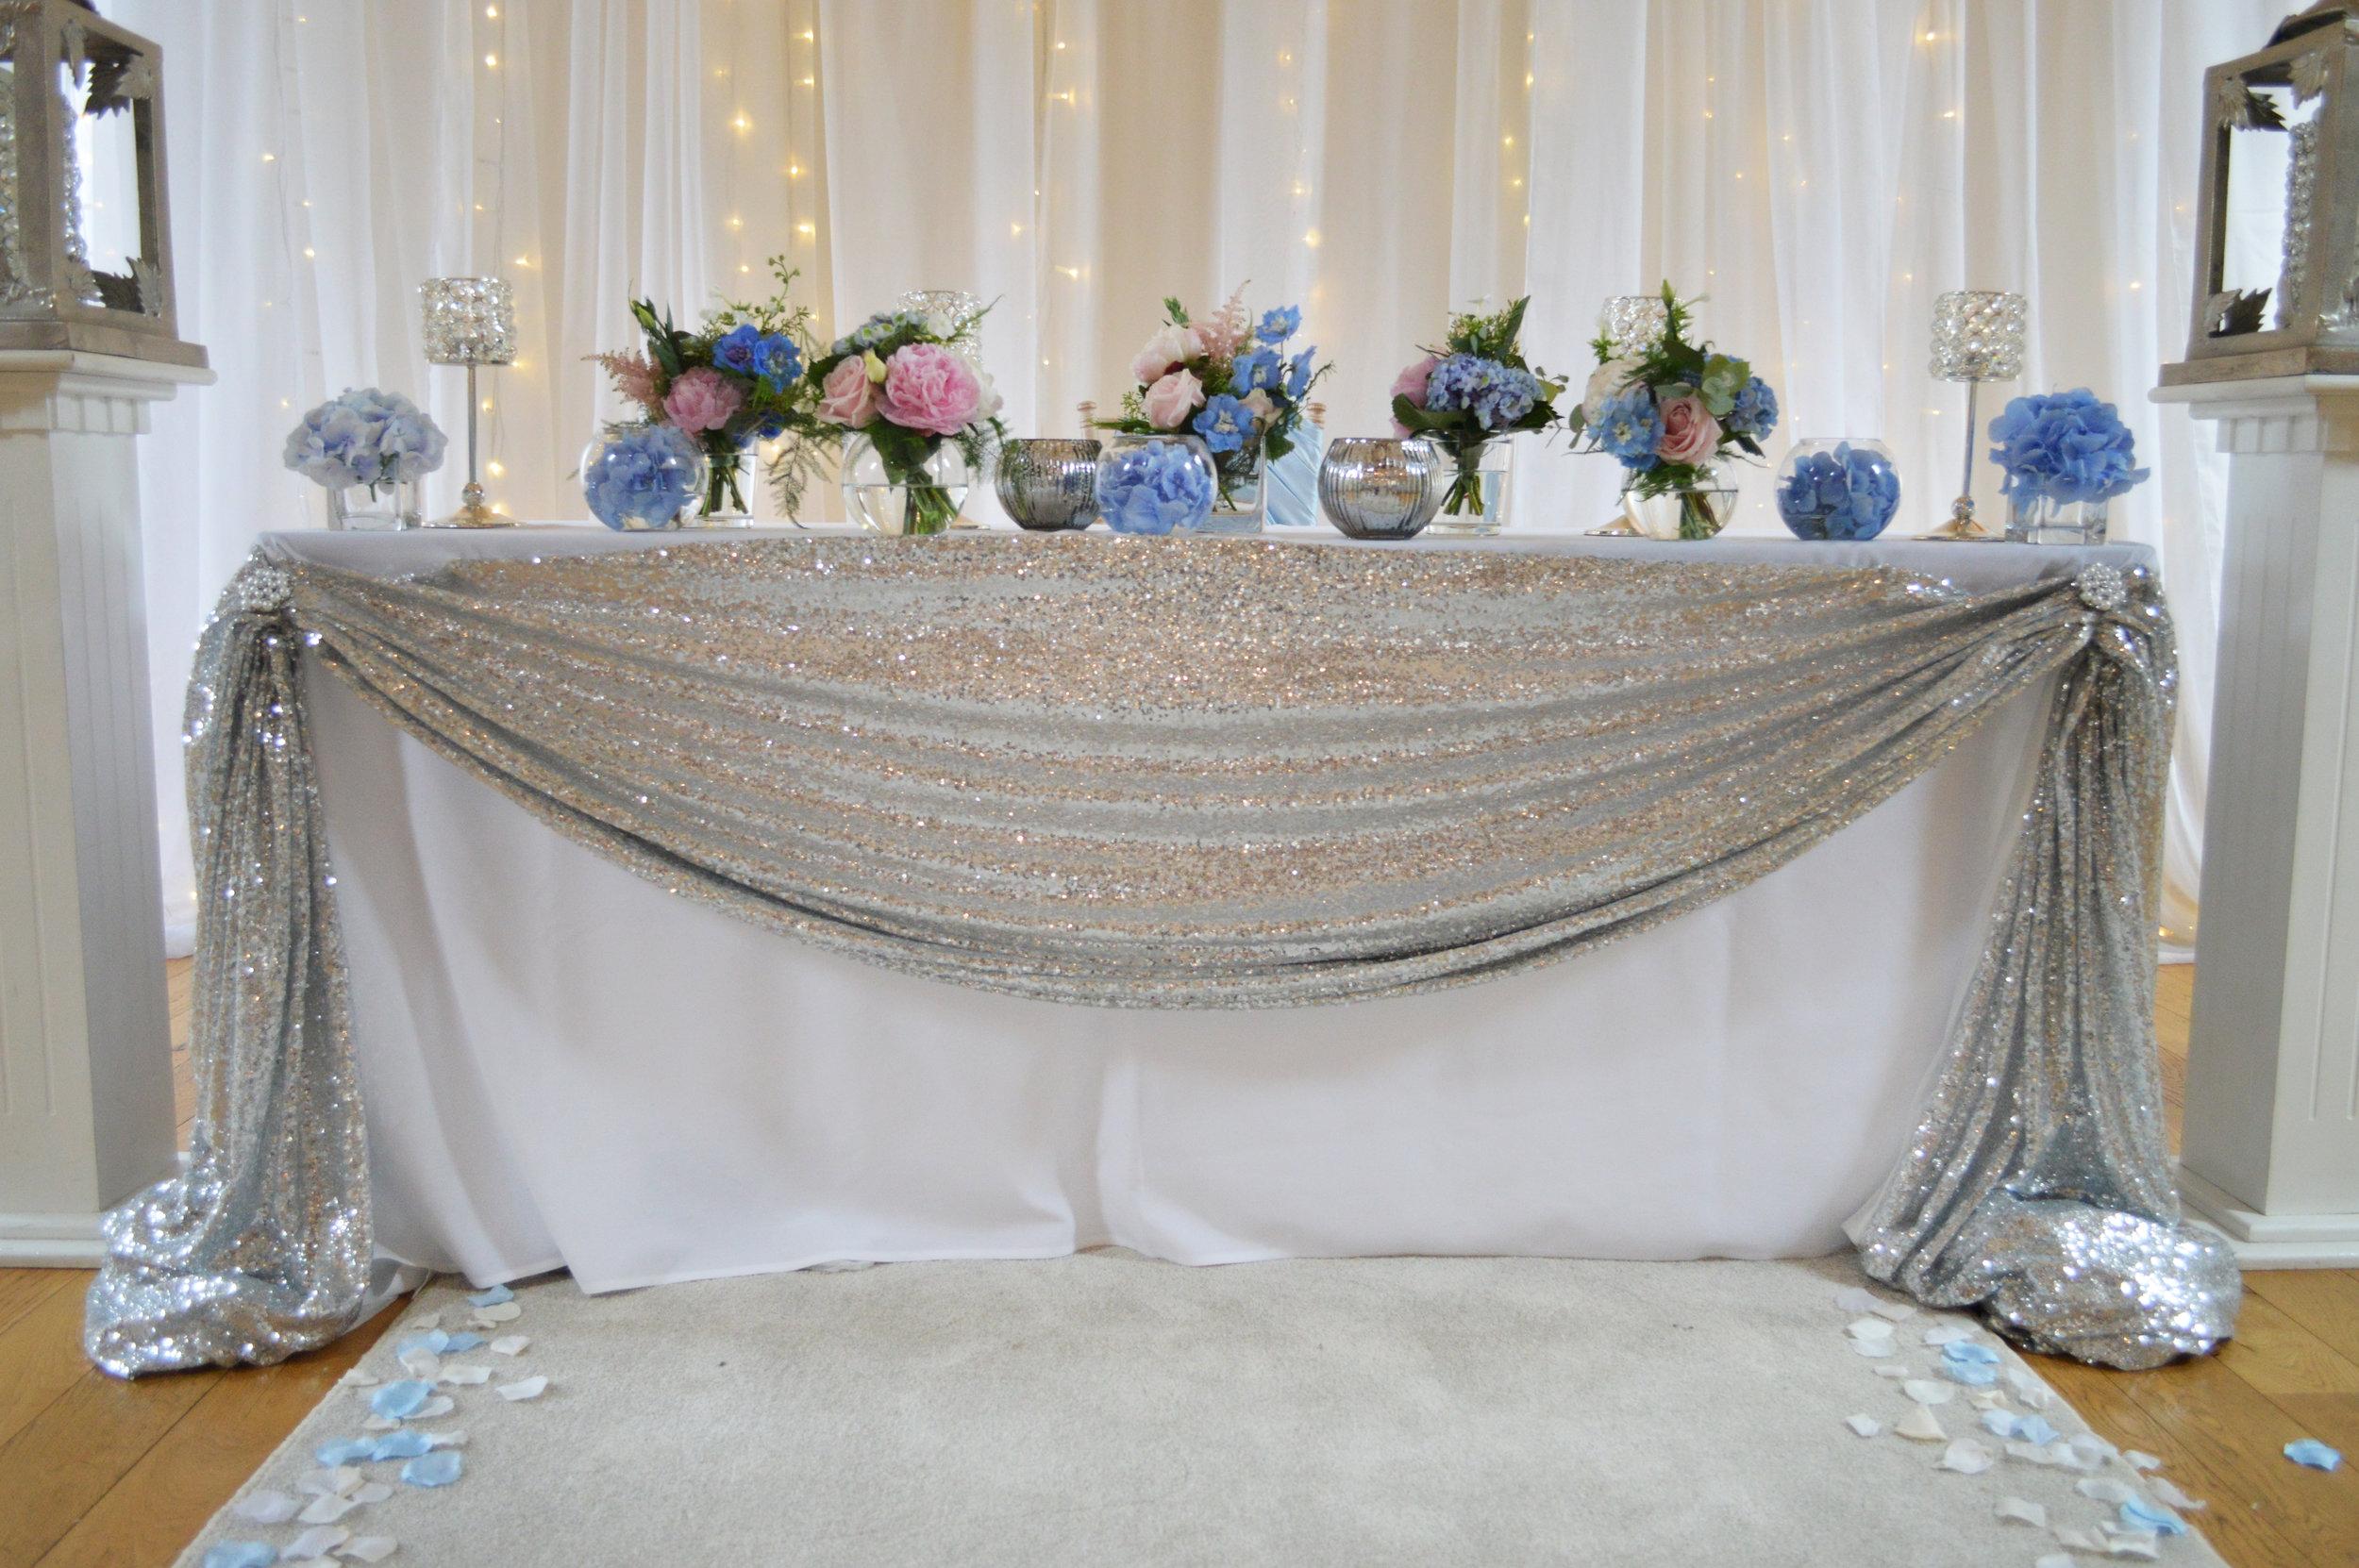 Registrar table sequin drape